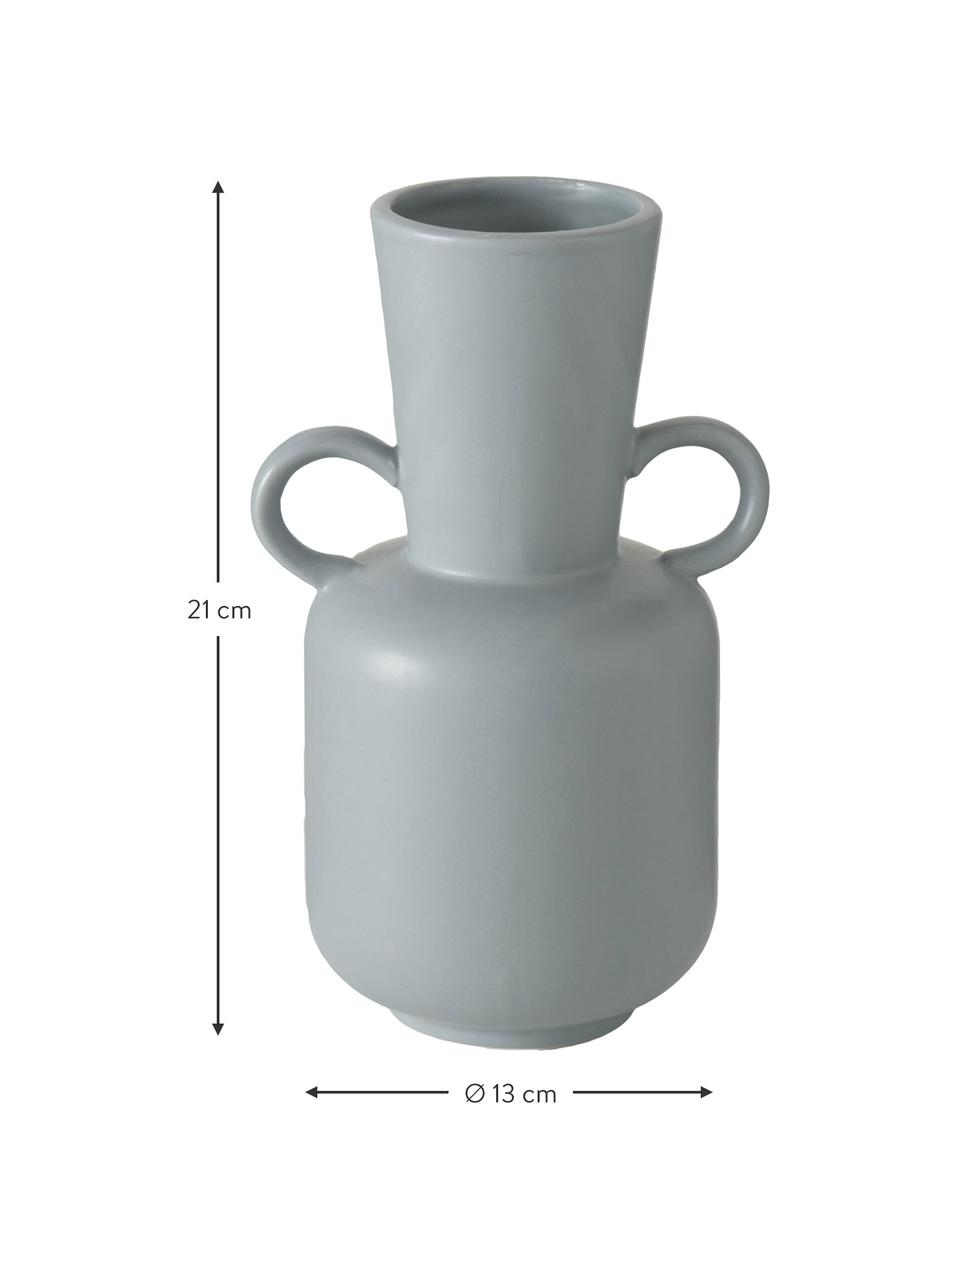 Steingut-Vasen-Set Danjin, 2-tlg., Steingut, Grau, Sondergrößen